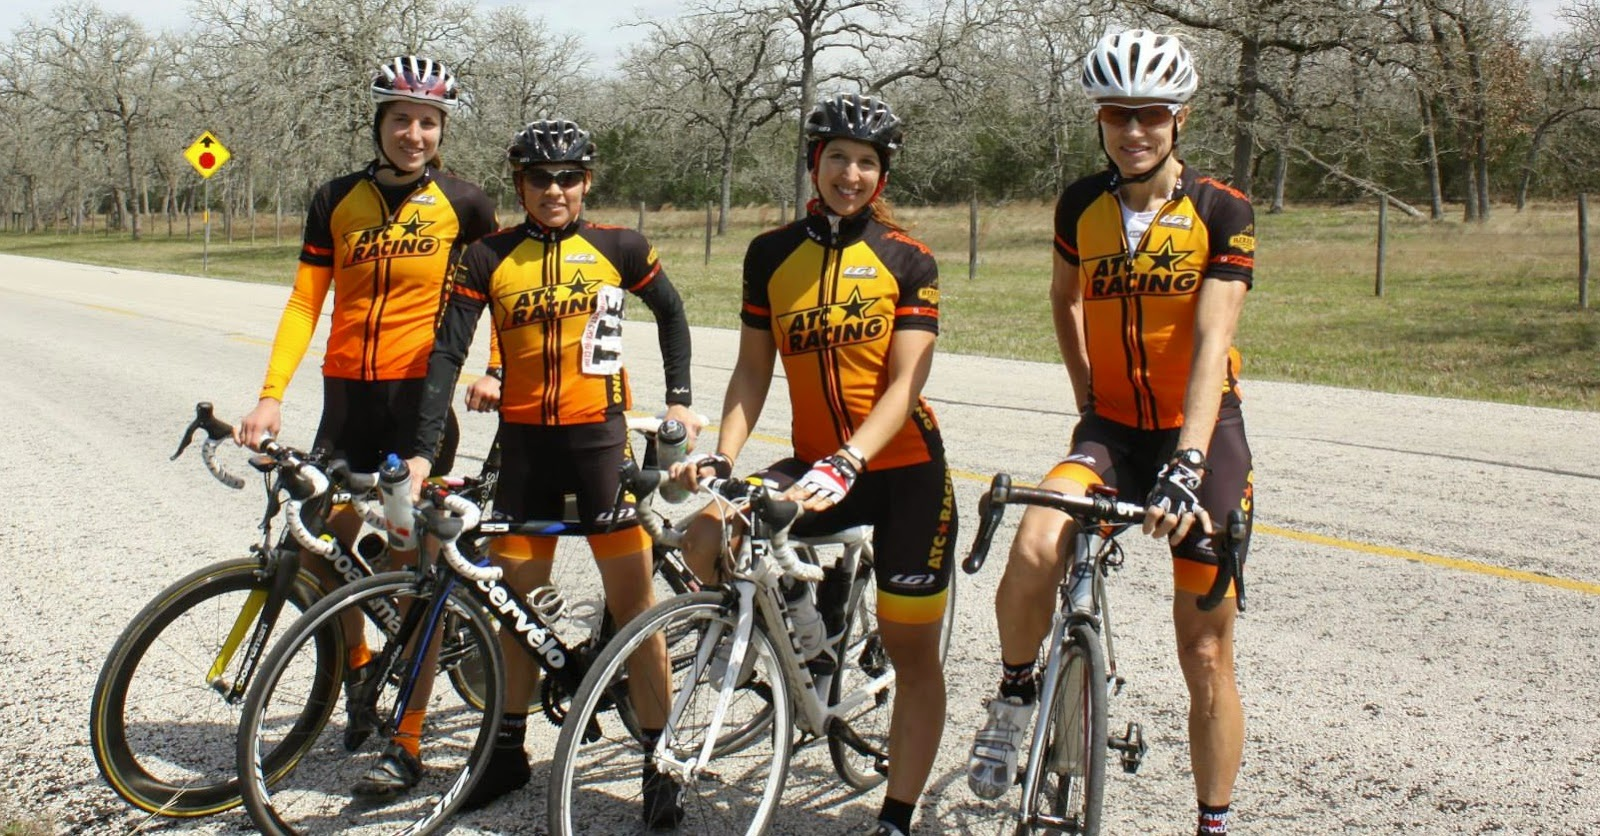 Austin Texas Triathlon News, Reviews, Events: For New Women